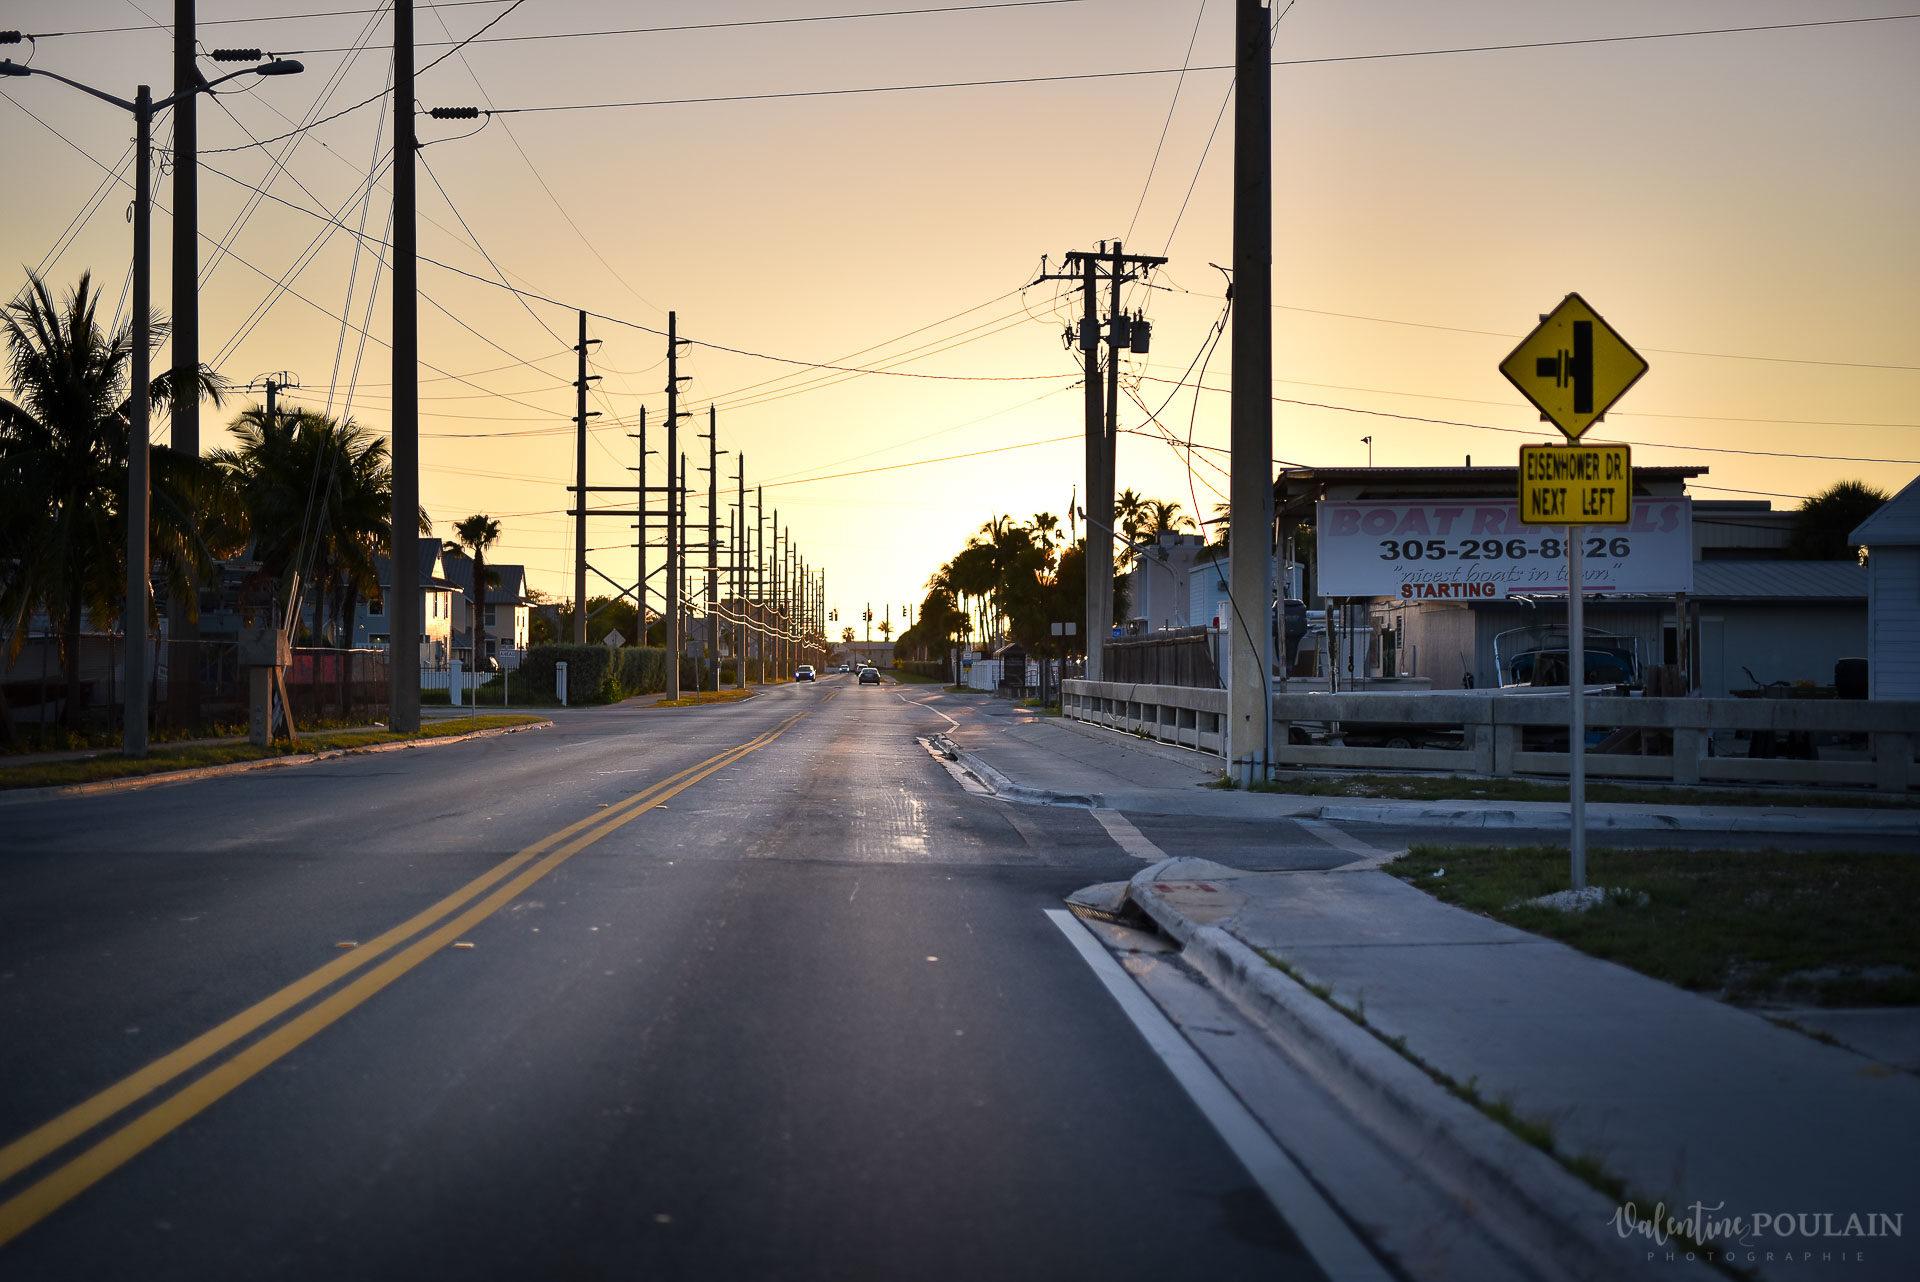 sunset landscape Miami